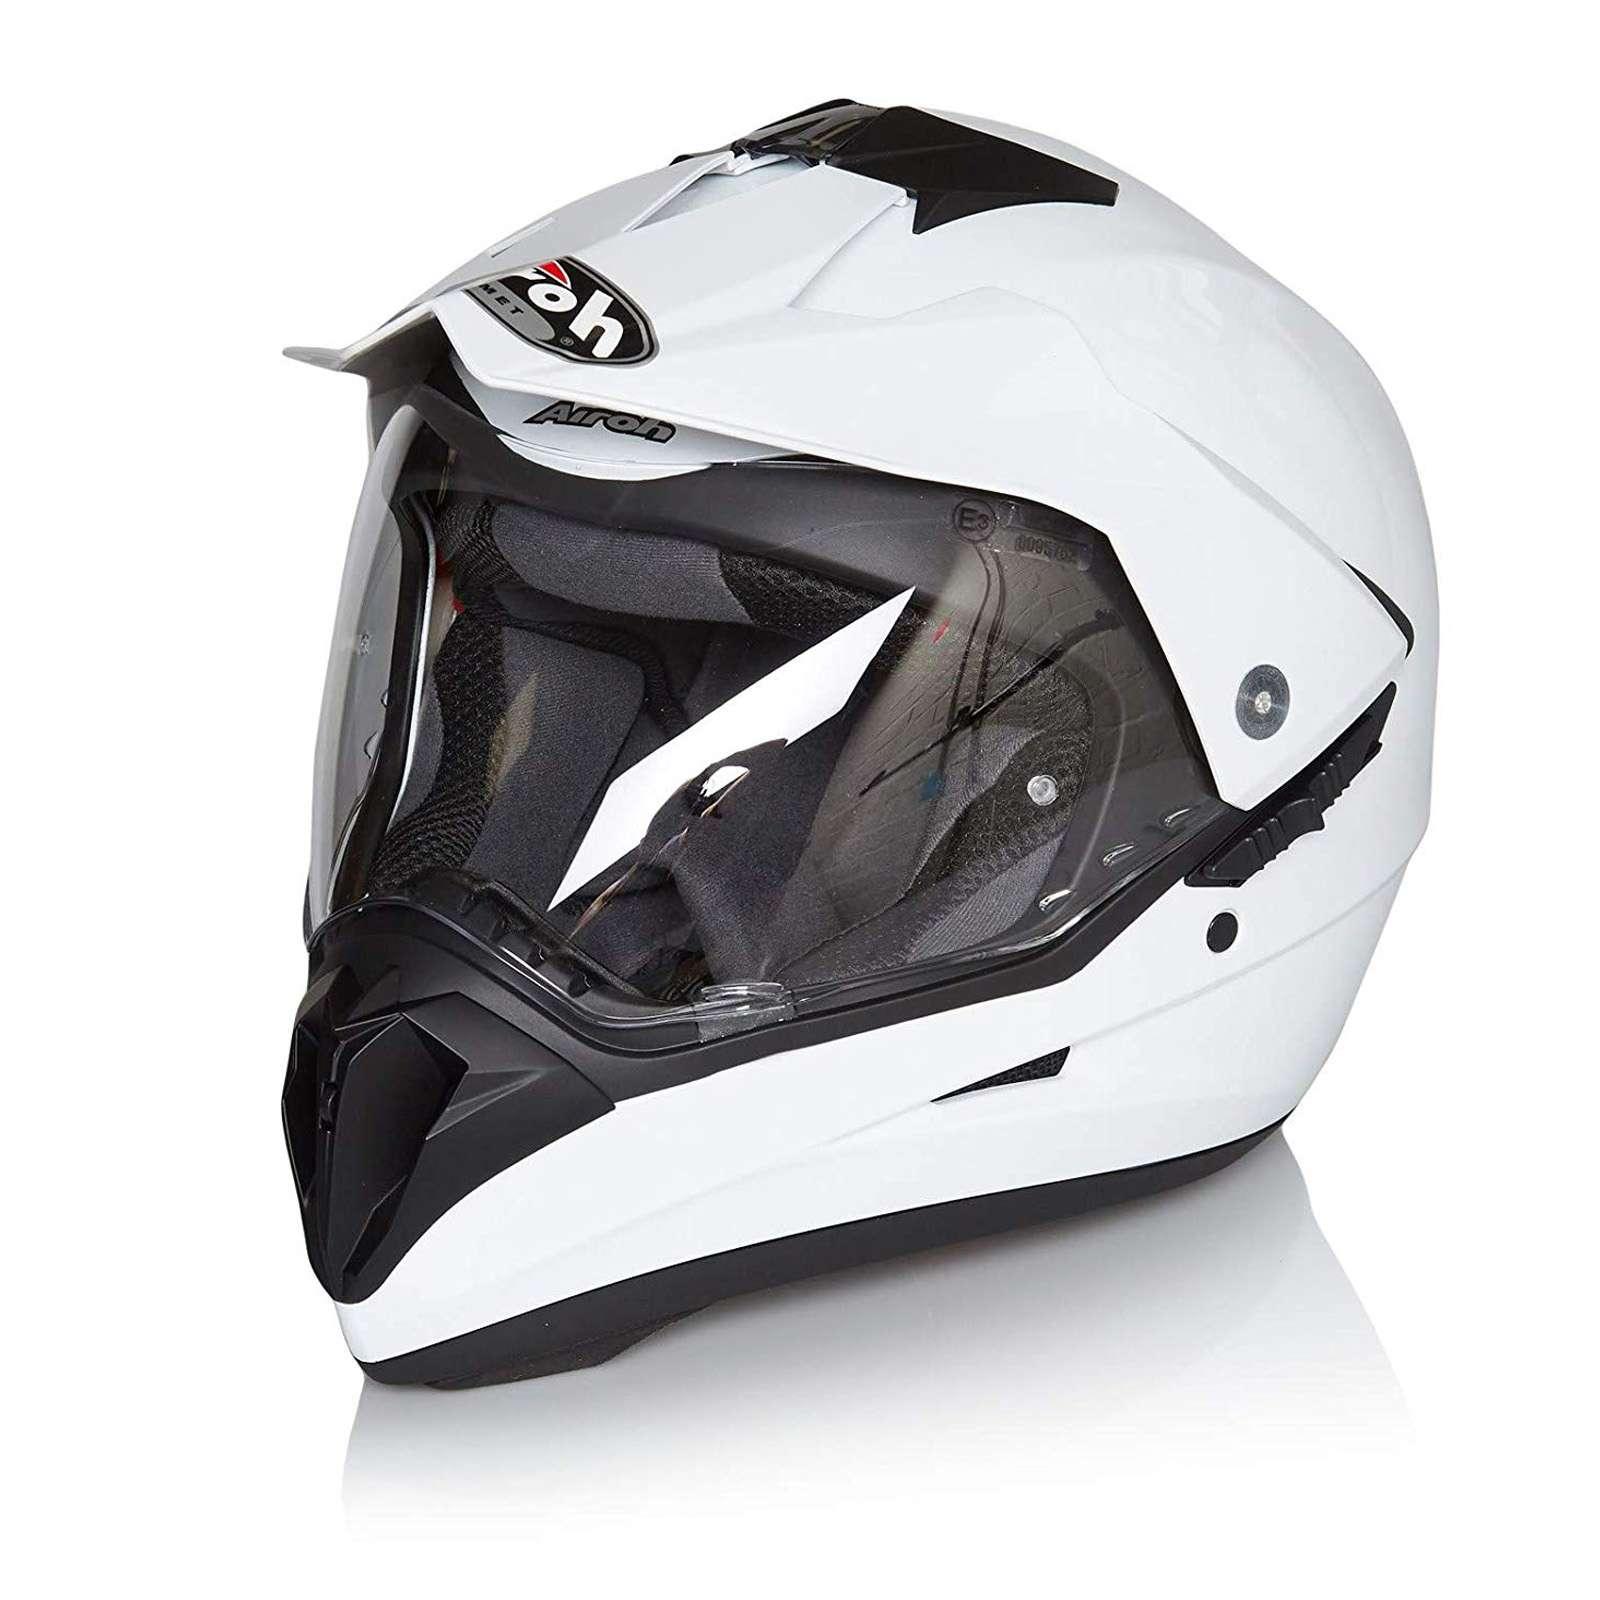 Airoh Twist Replacement//Spare MX Helmet Peak Color White